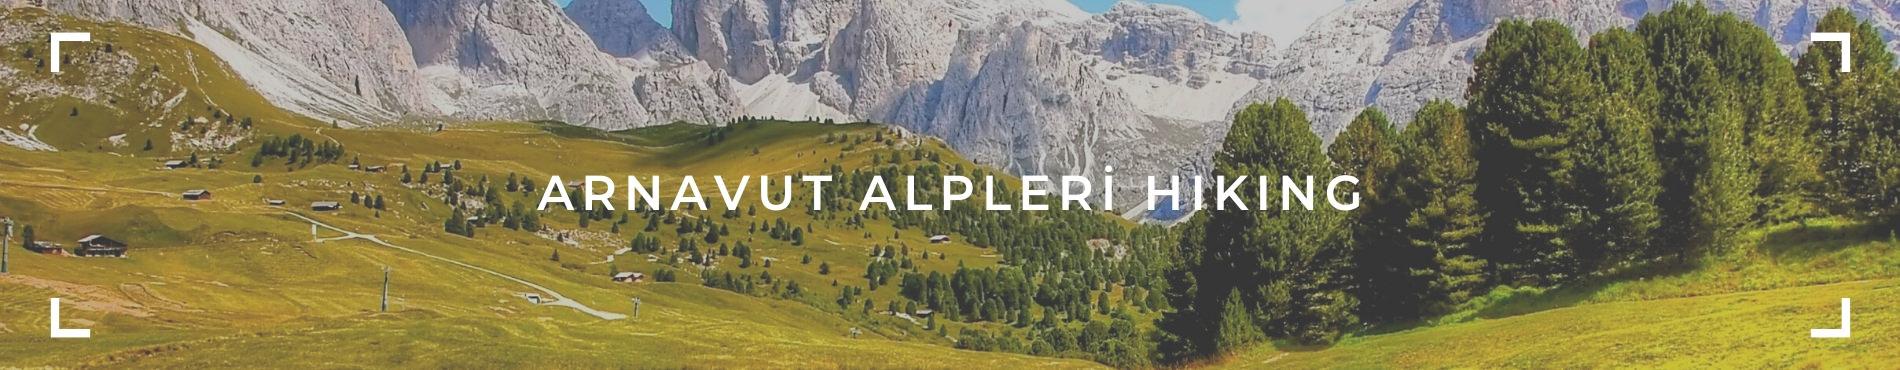 ARNAVUT ALPLERİ HIKING